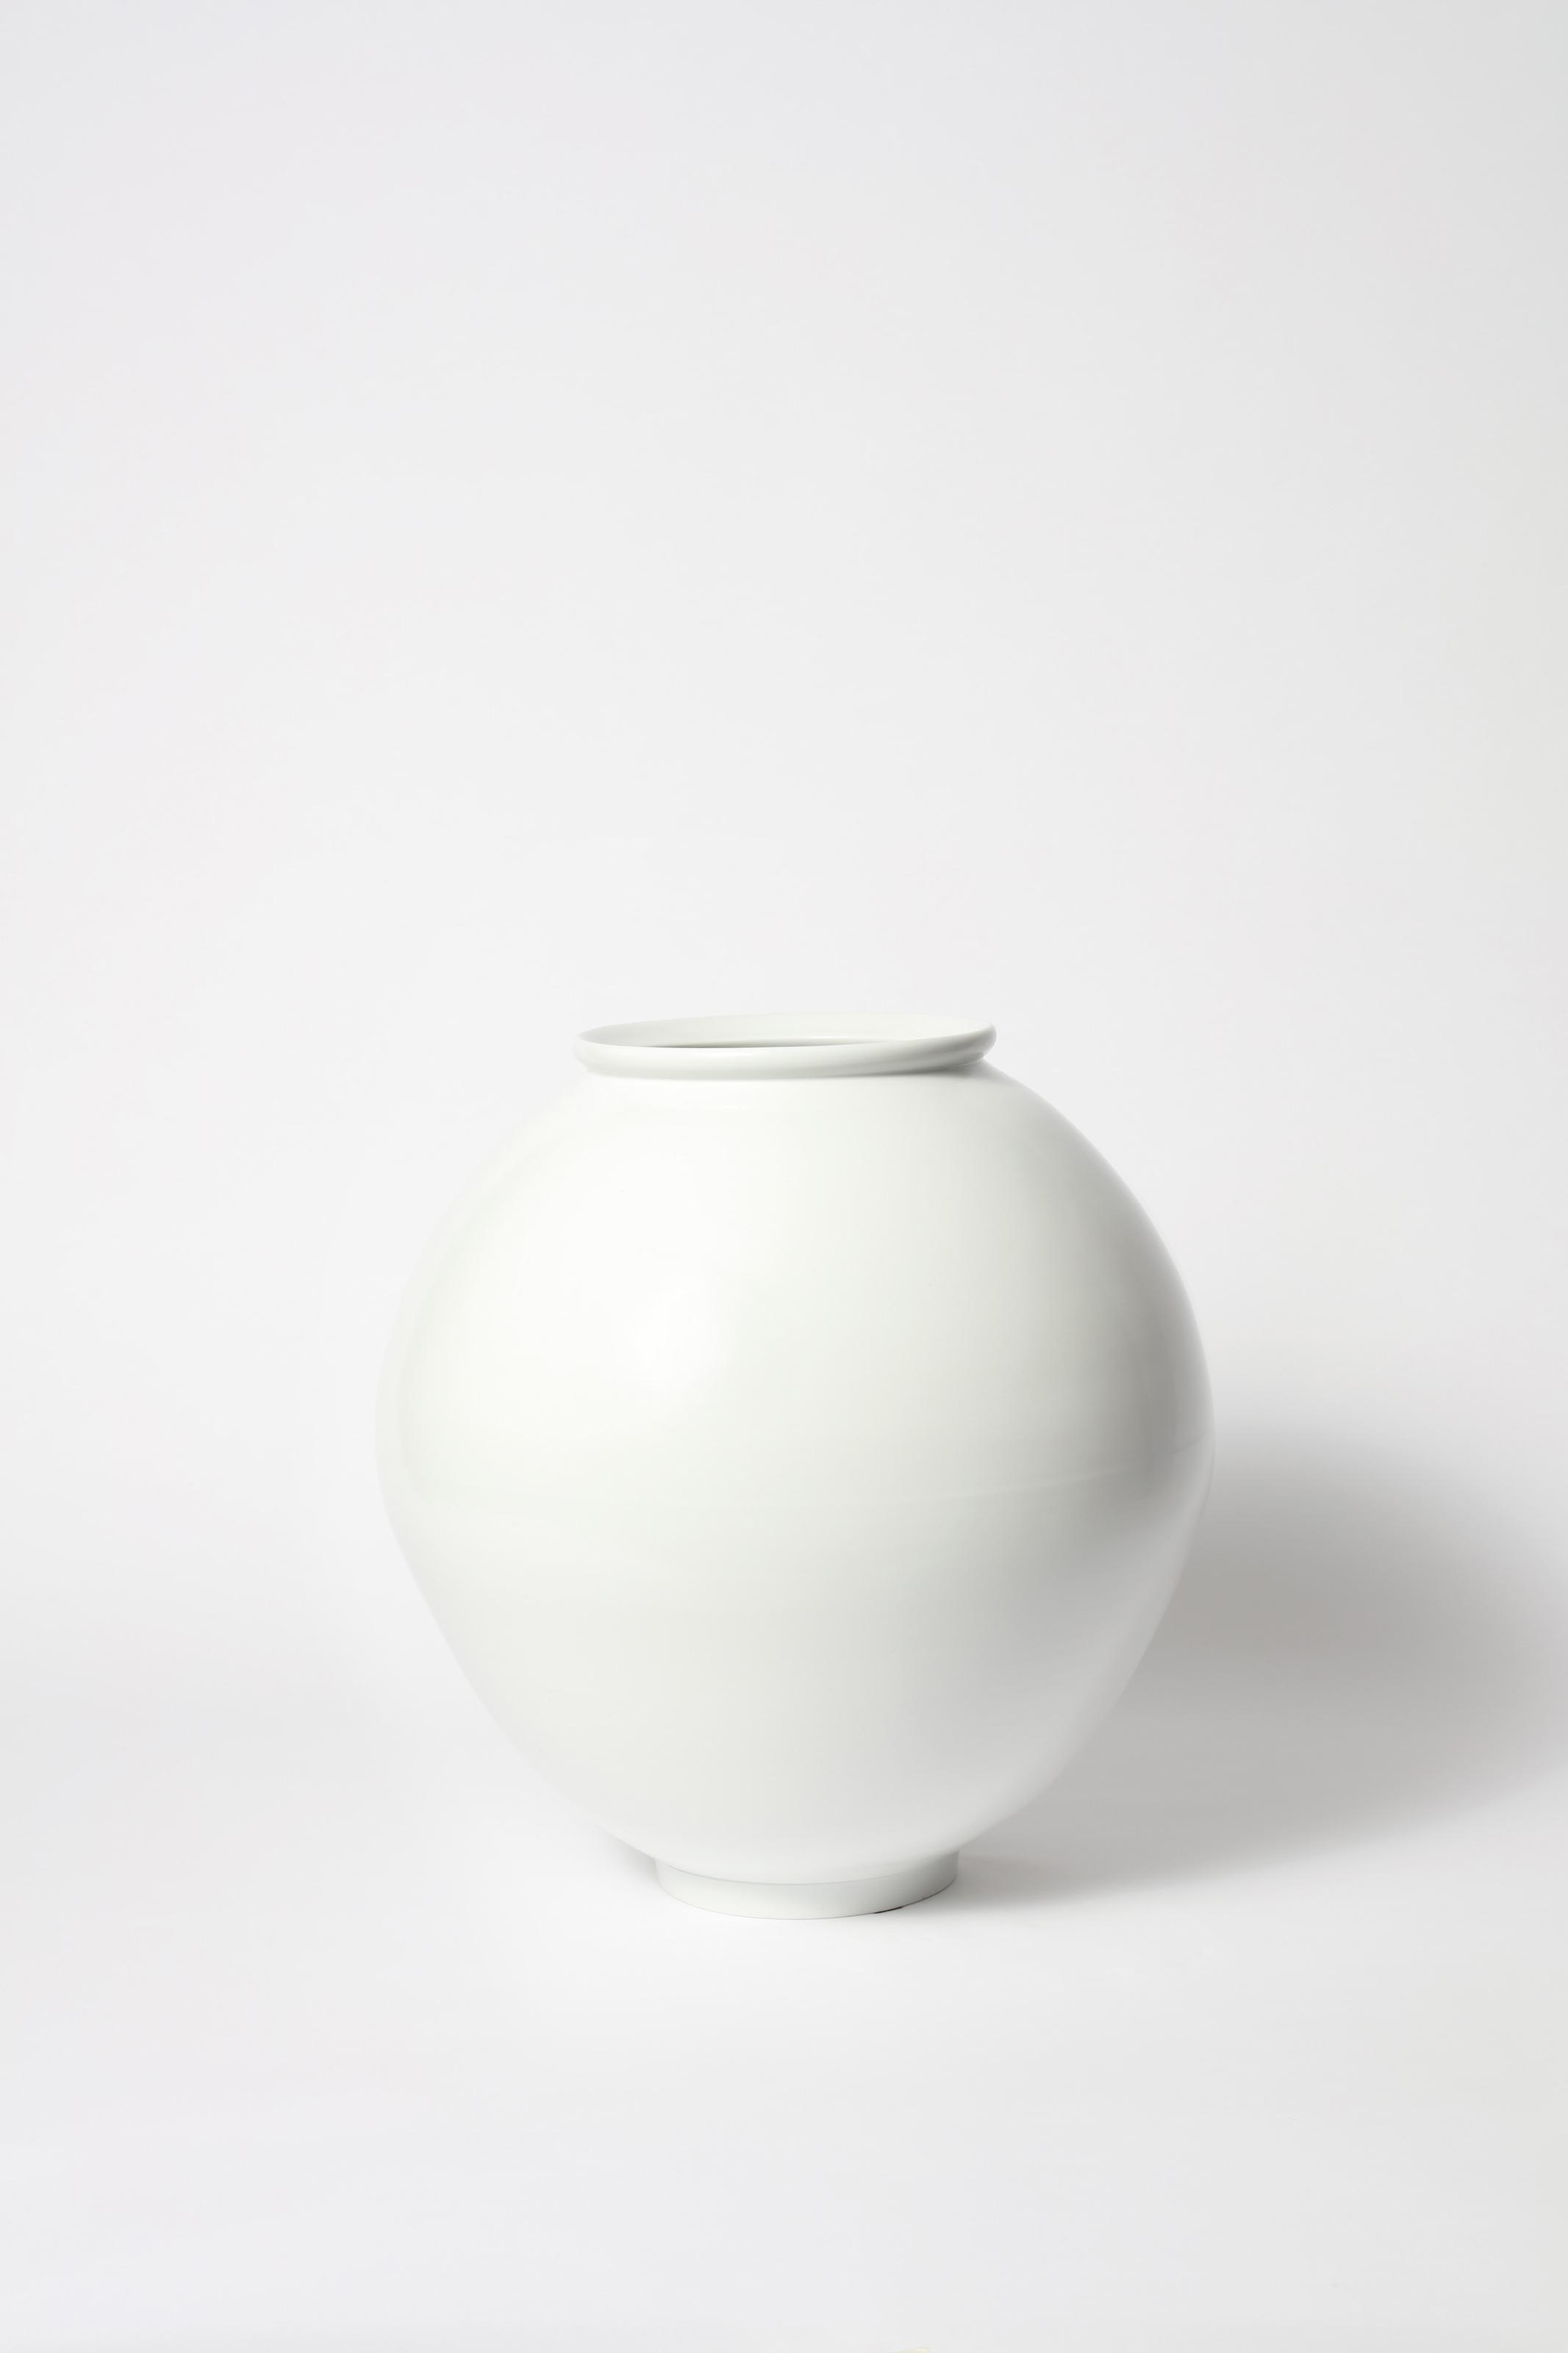 'MOON JAR'  A white glazed moo